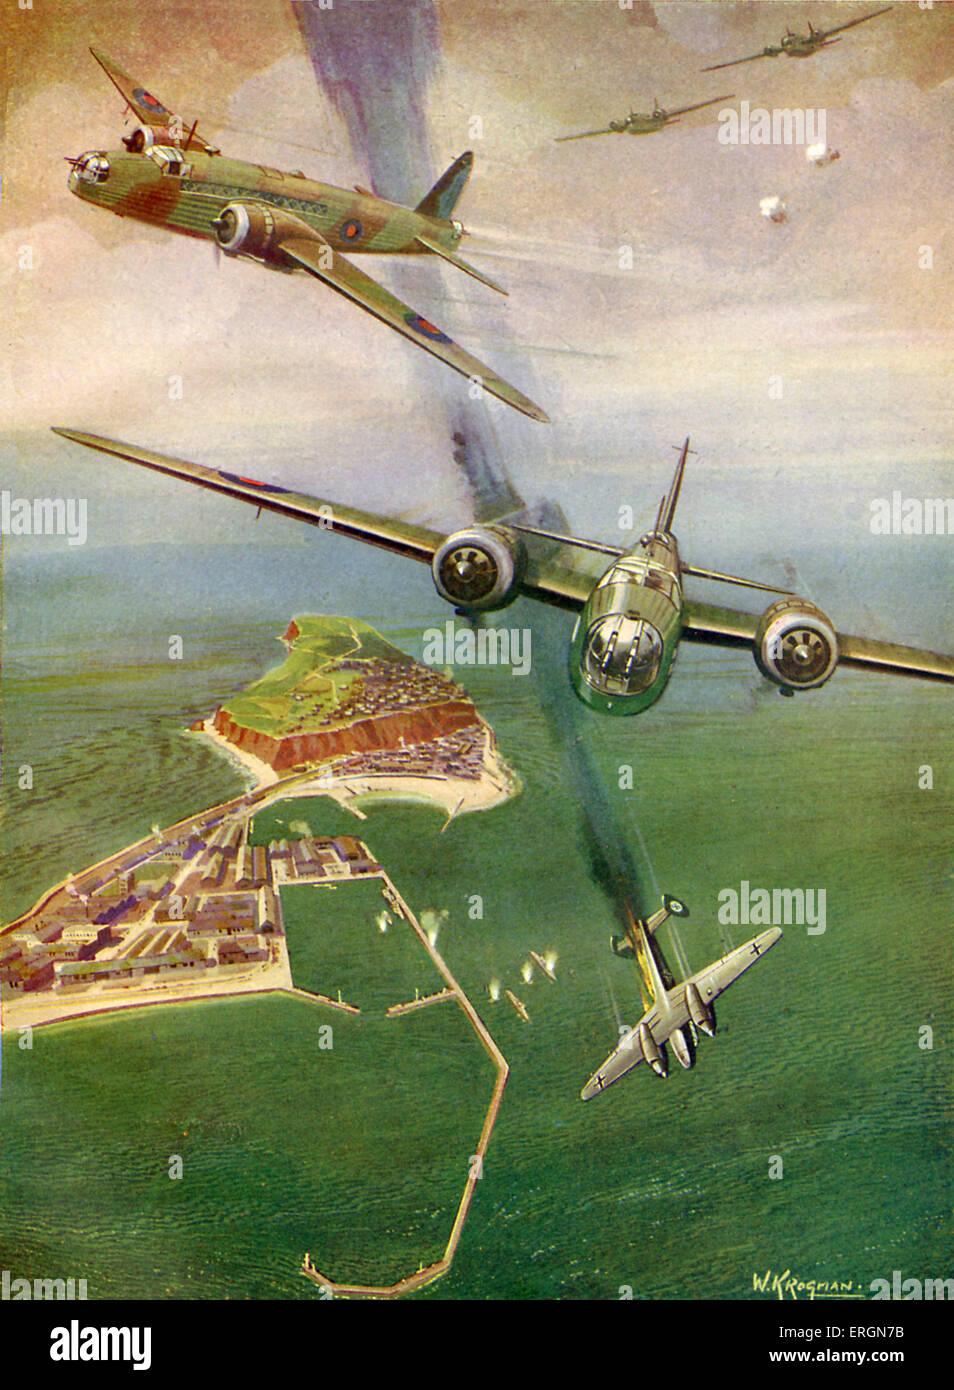 WW2 - British Wellington bombers destroy a German  Me 110  (Messerschmitt Bf 110)  plane off the island of Heligoland, - Stock Image